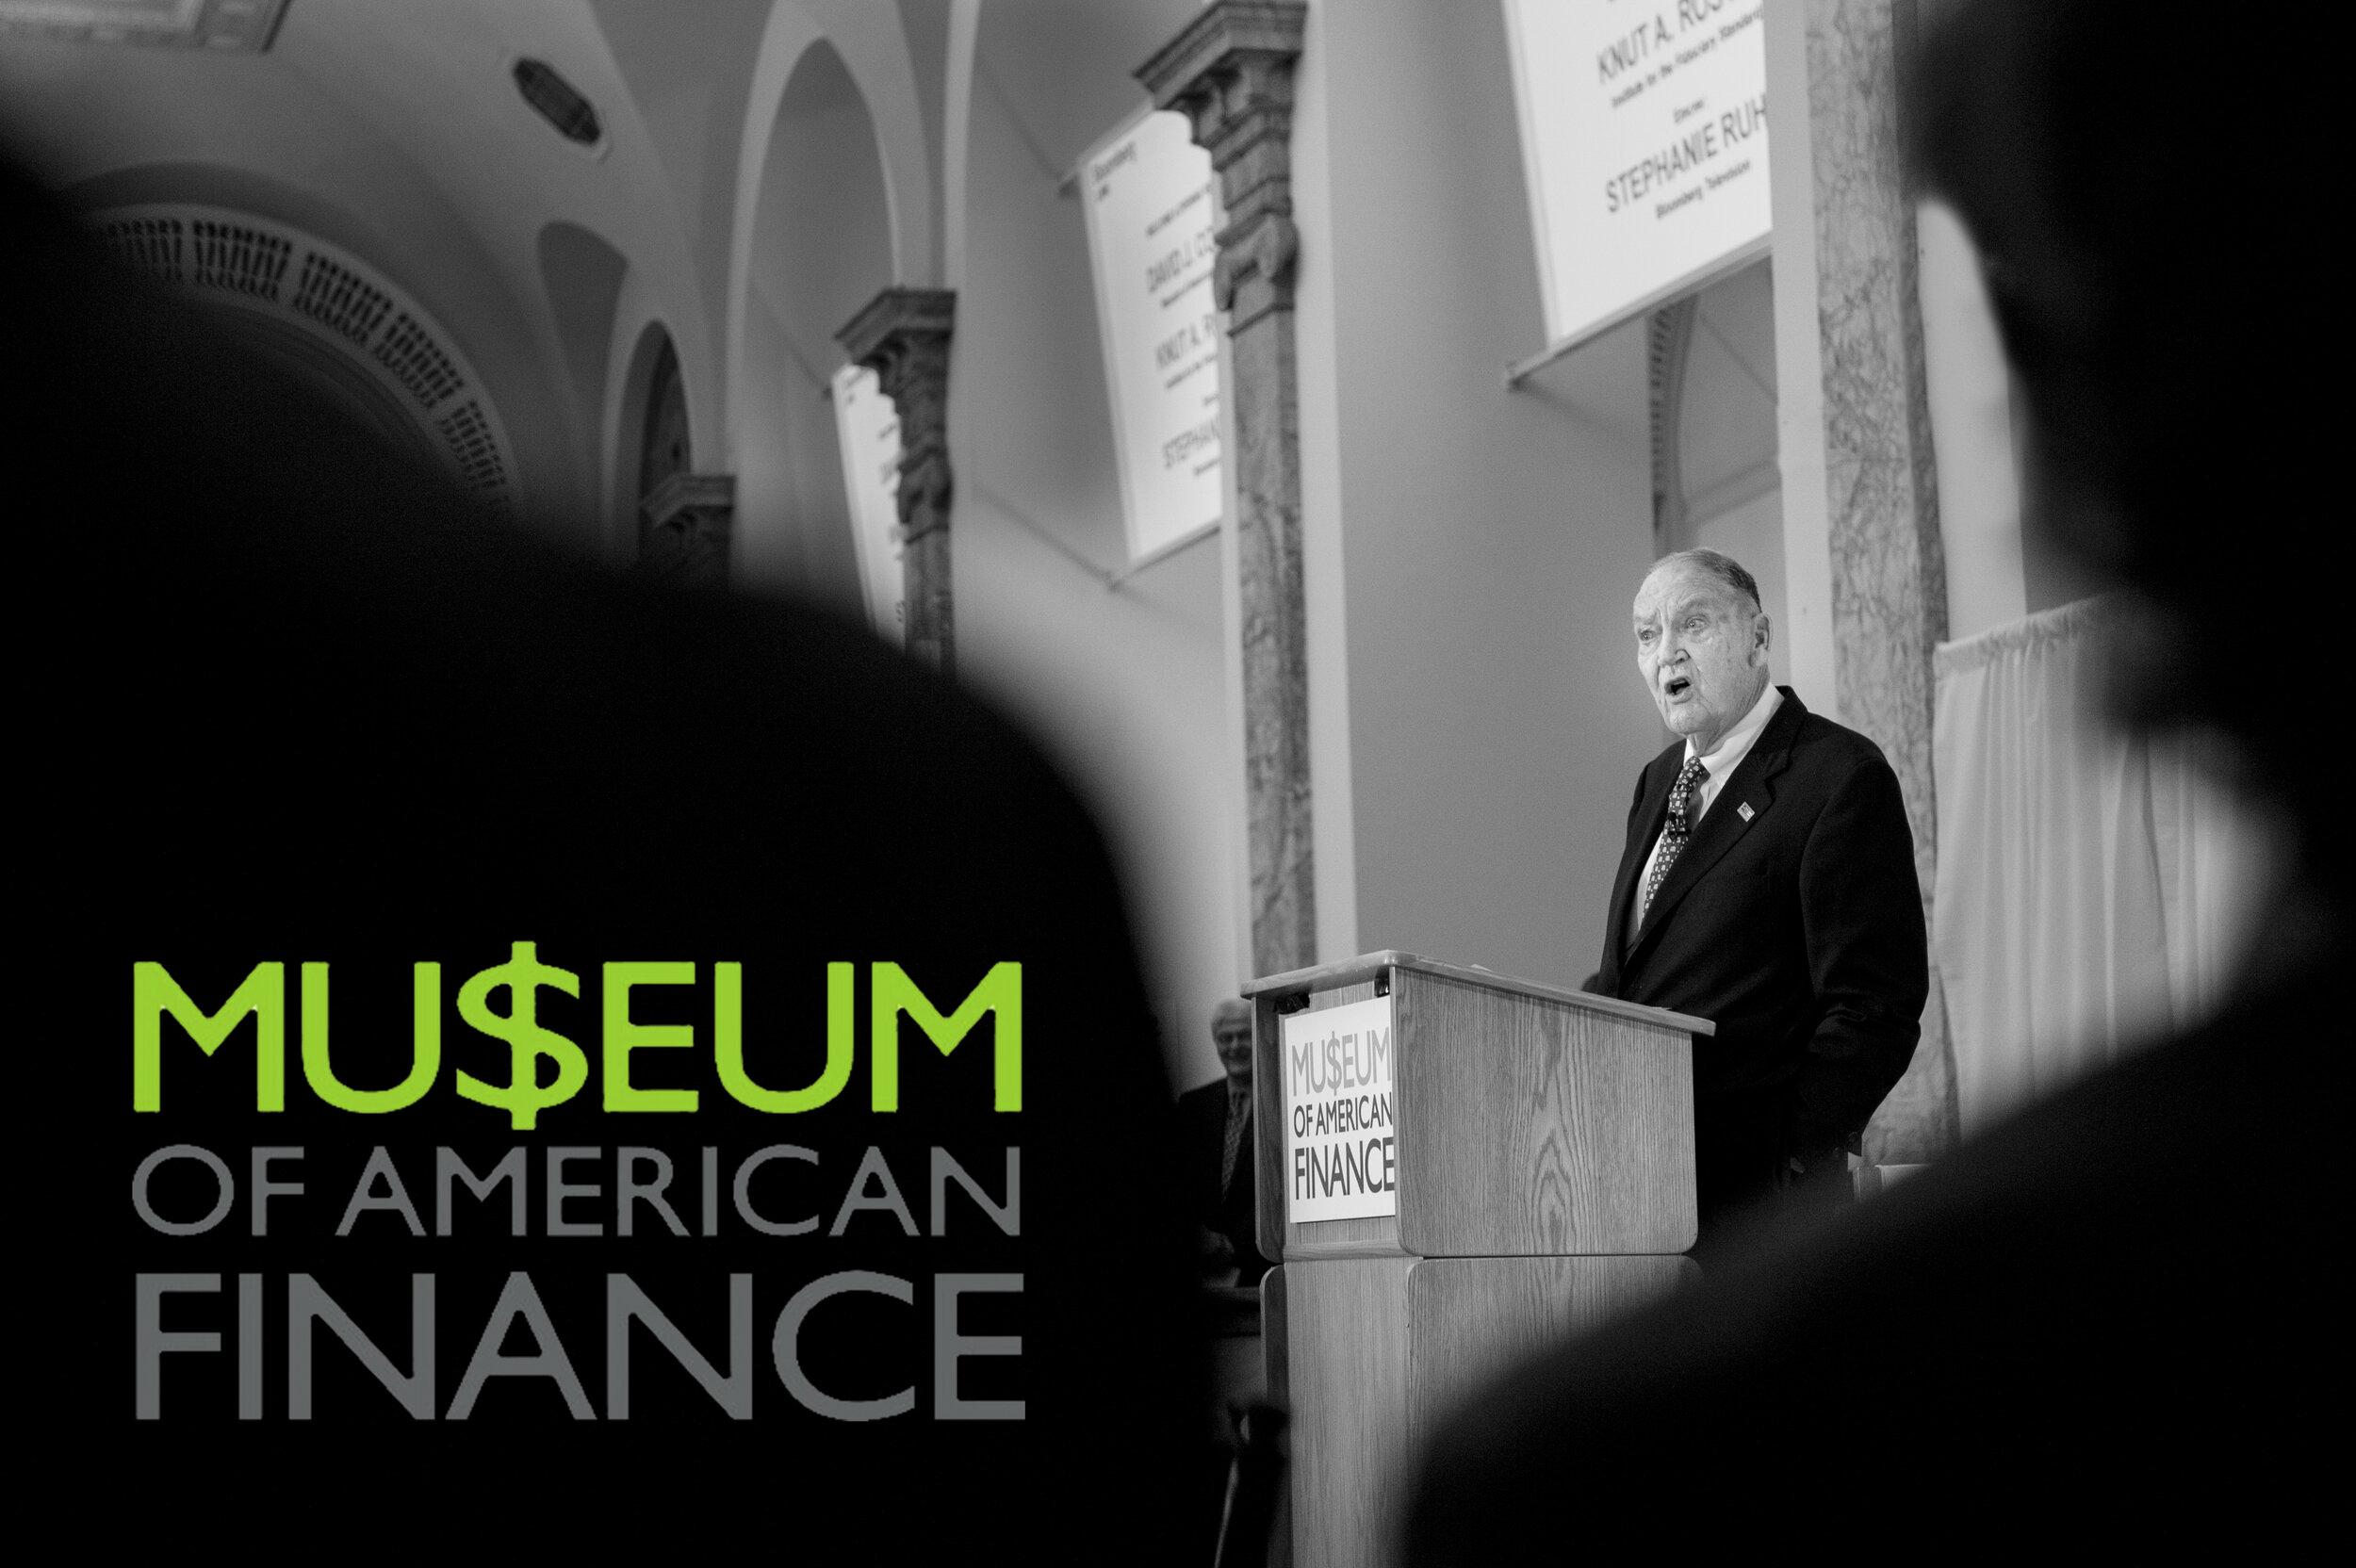 Portrait of Jack Bogle at Museum of American Finance